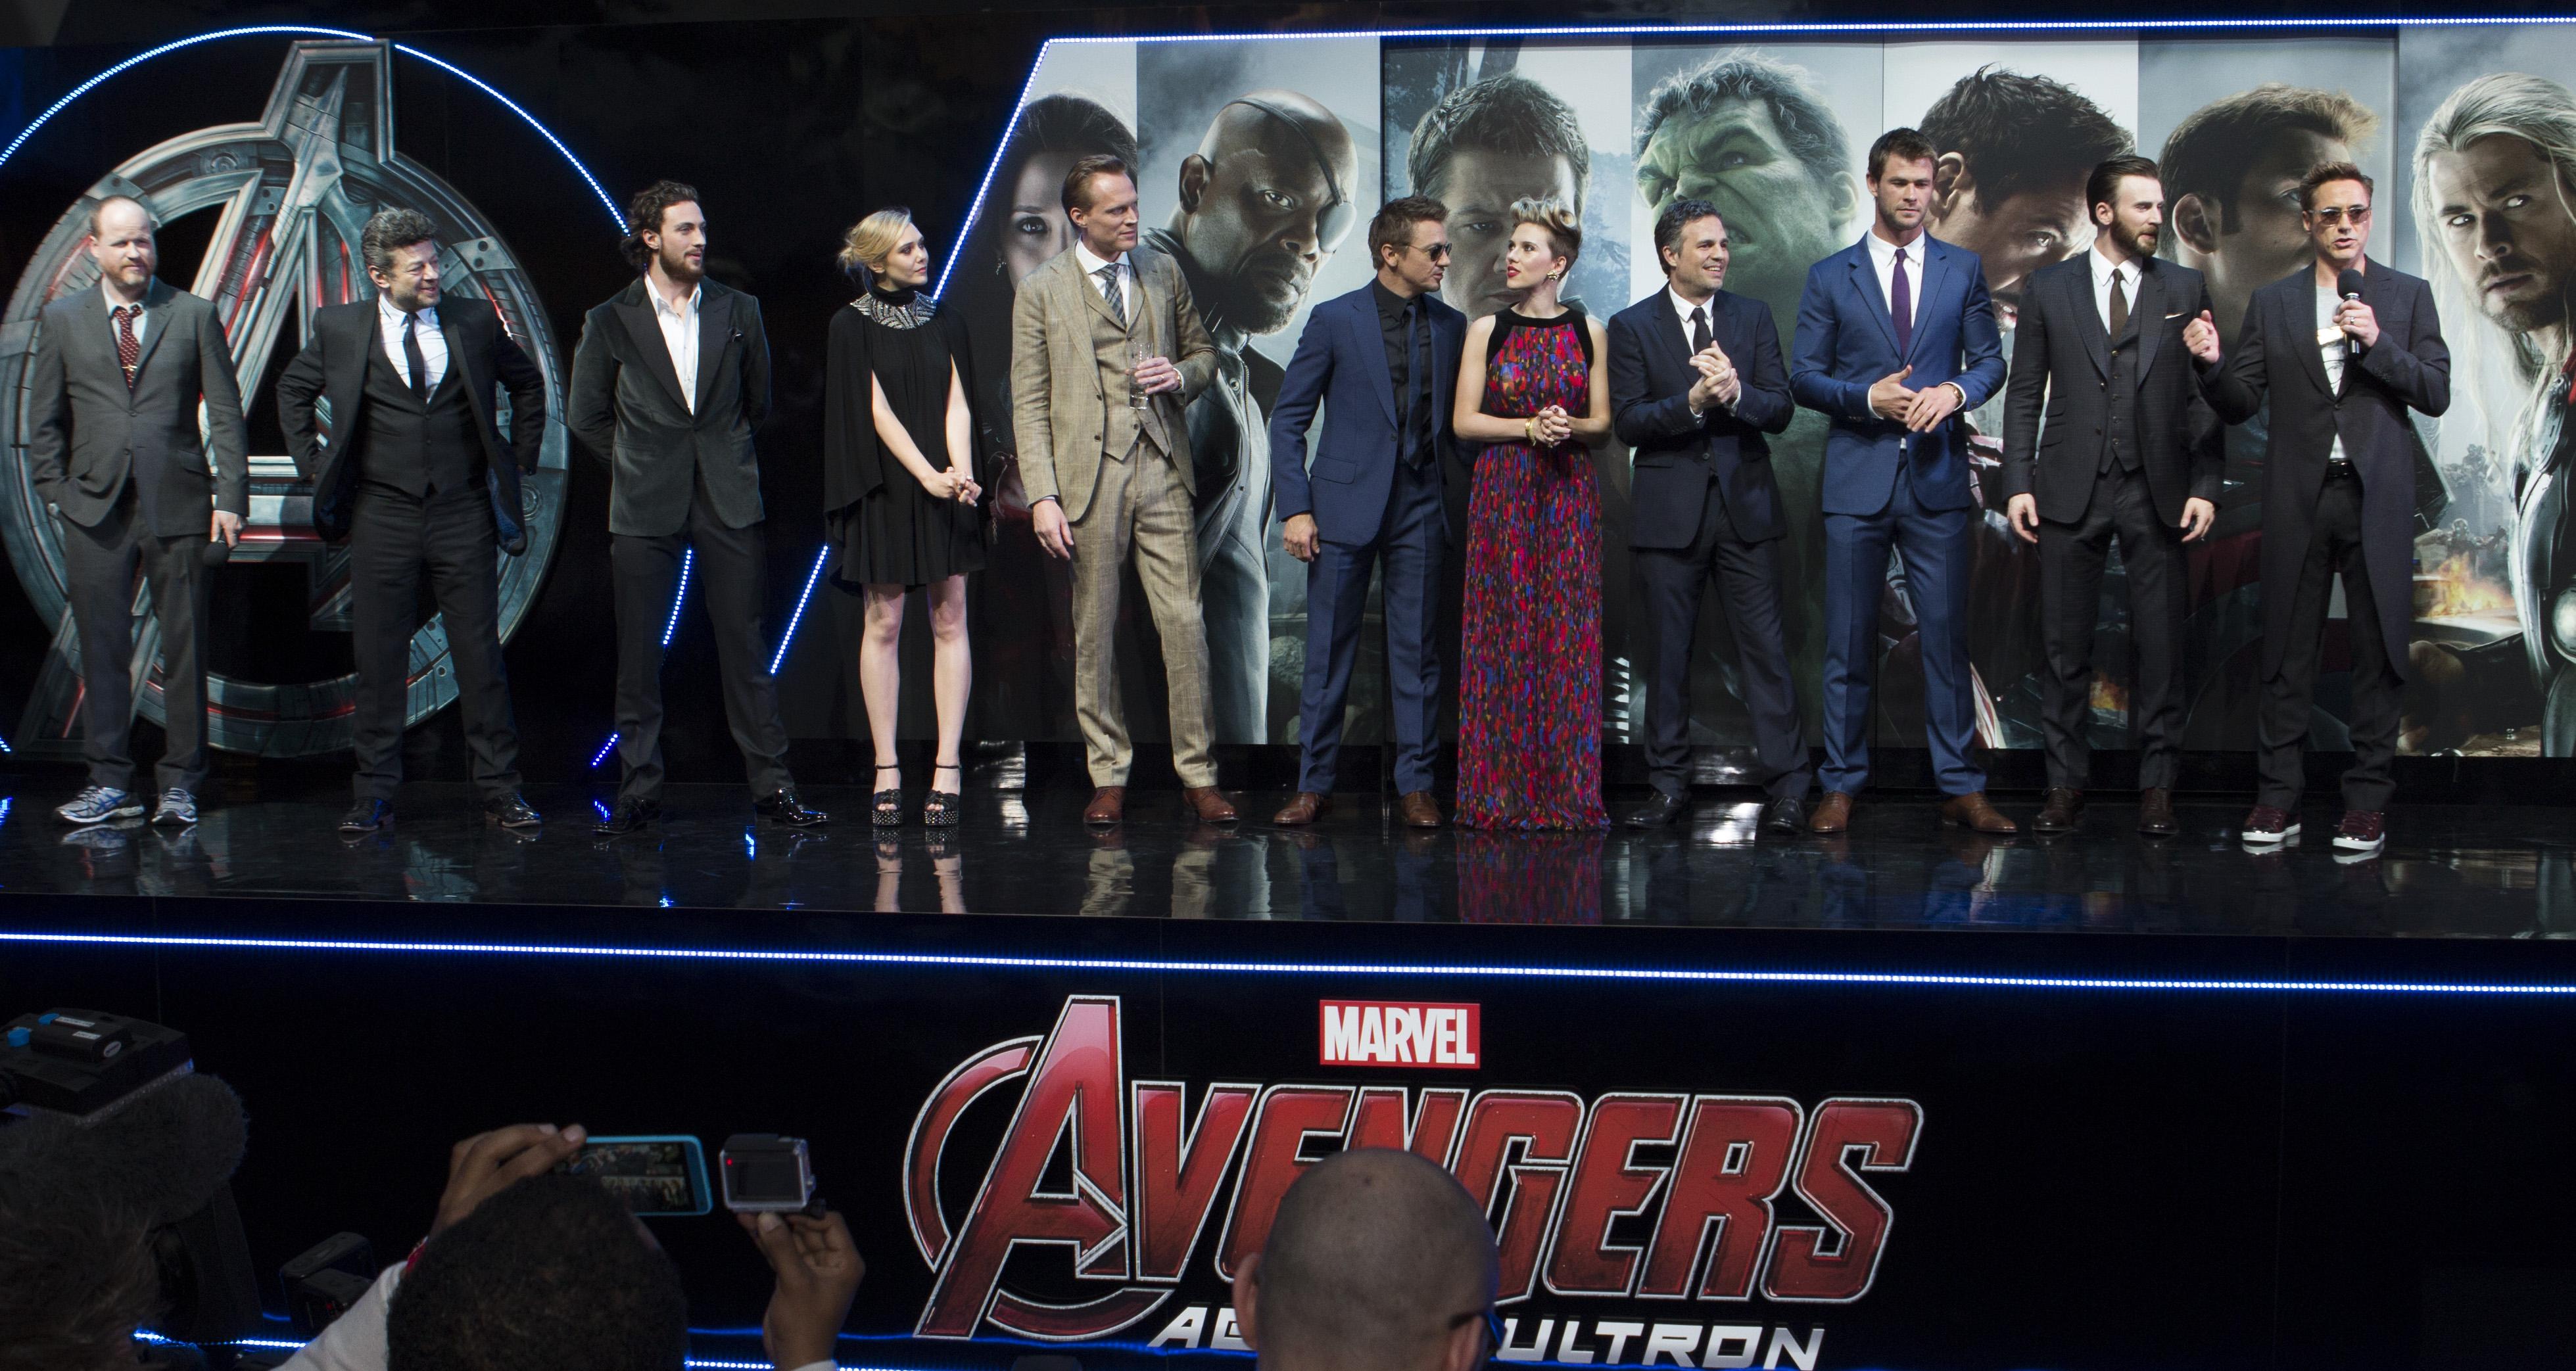 Avengers age of ultron london tour stop for Tour avengers